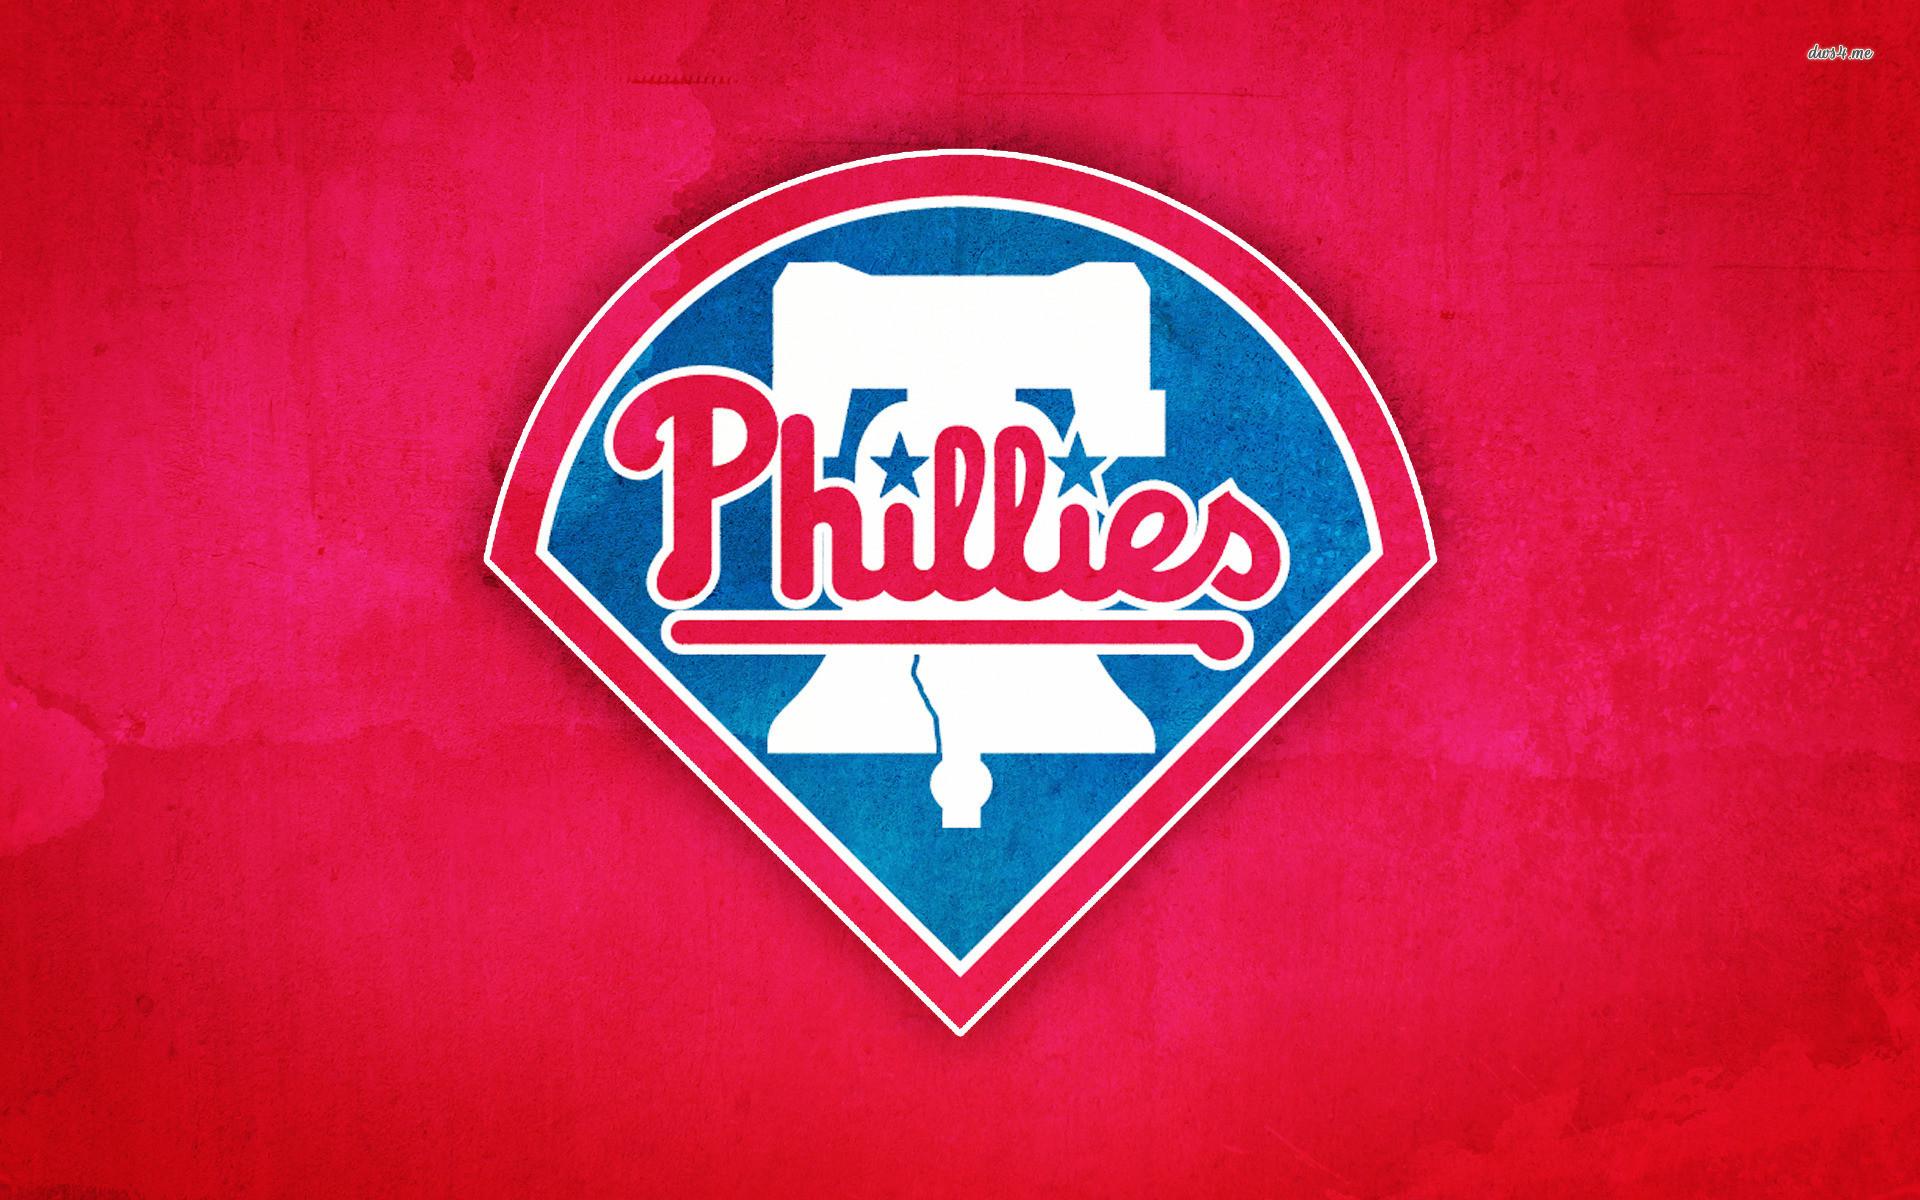 New York Yankees Wallpaper | MLB Baseball Themes | Pinterest | Baseball  season